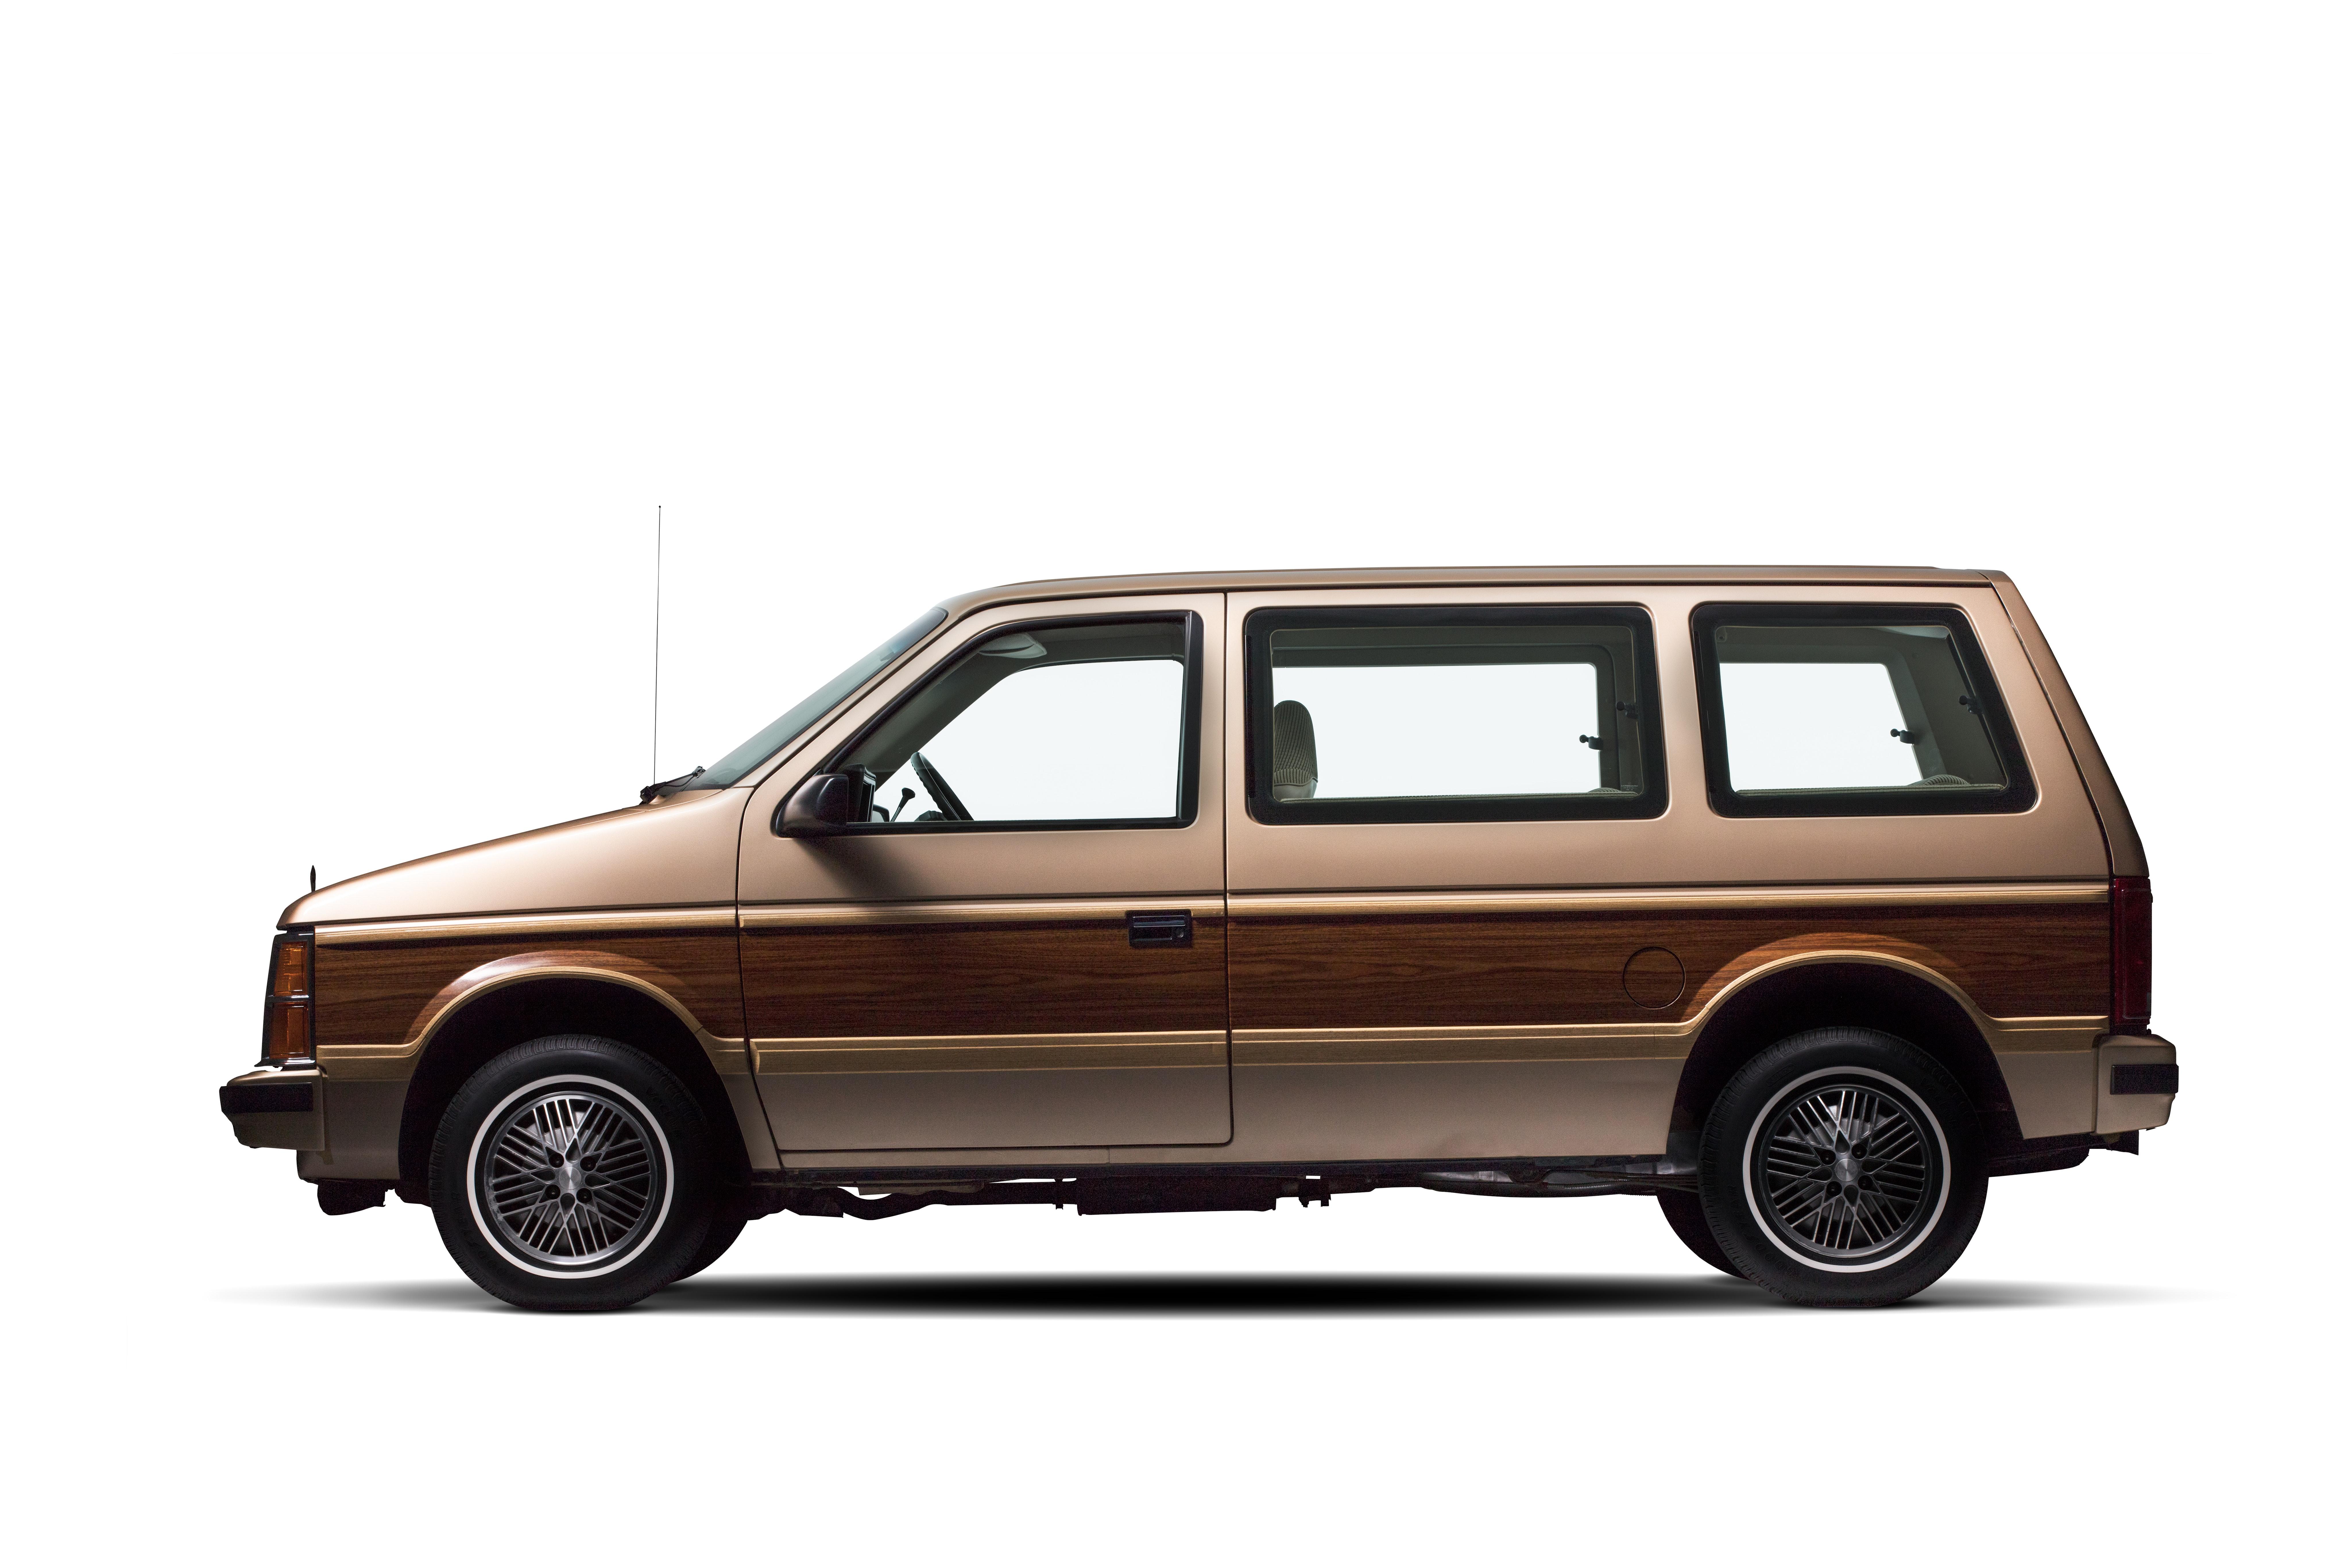 1984 Plymouth Voyager (Van)